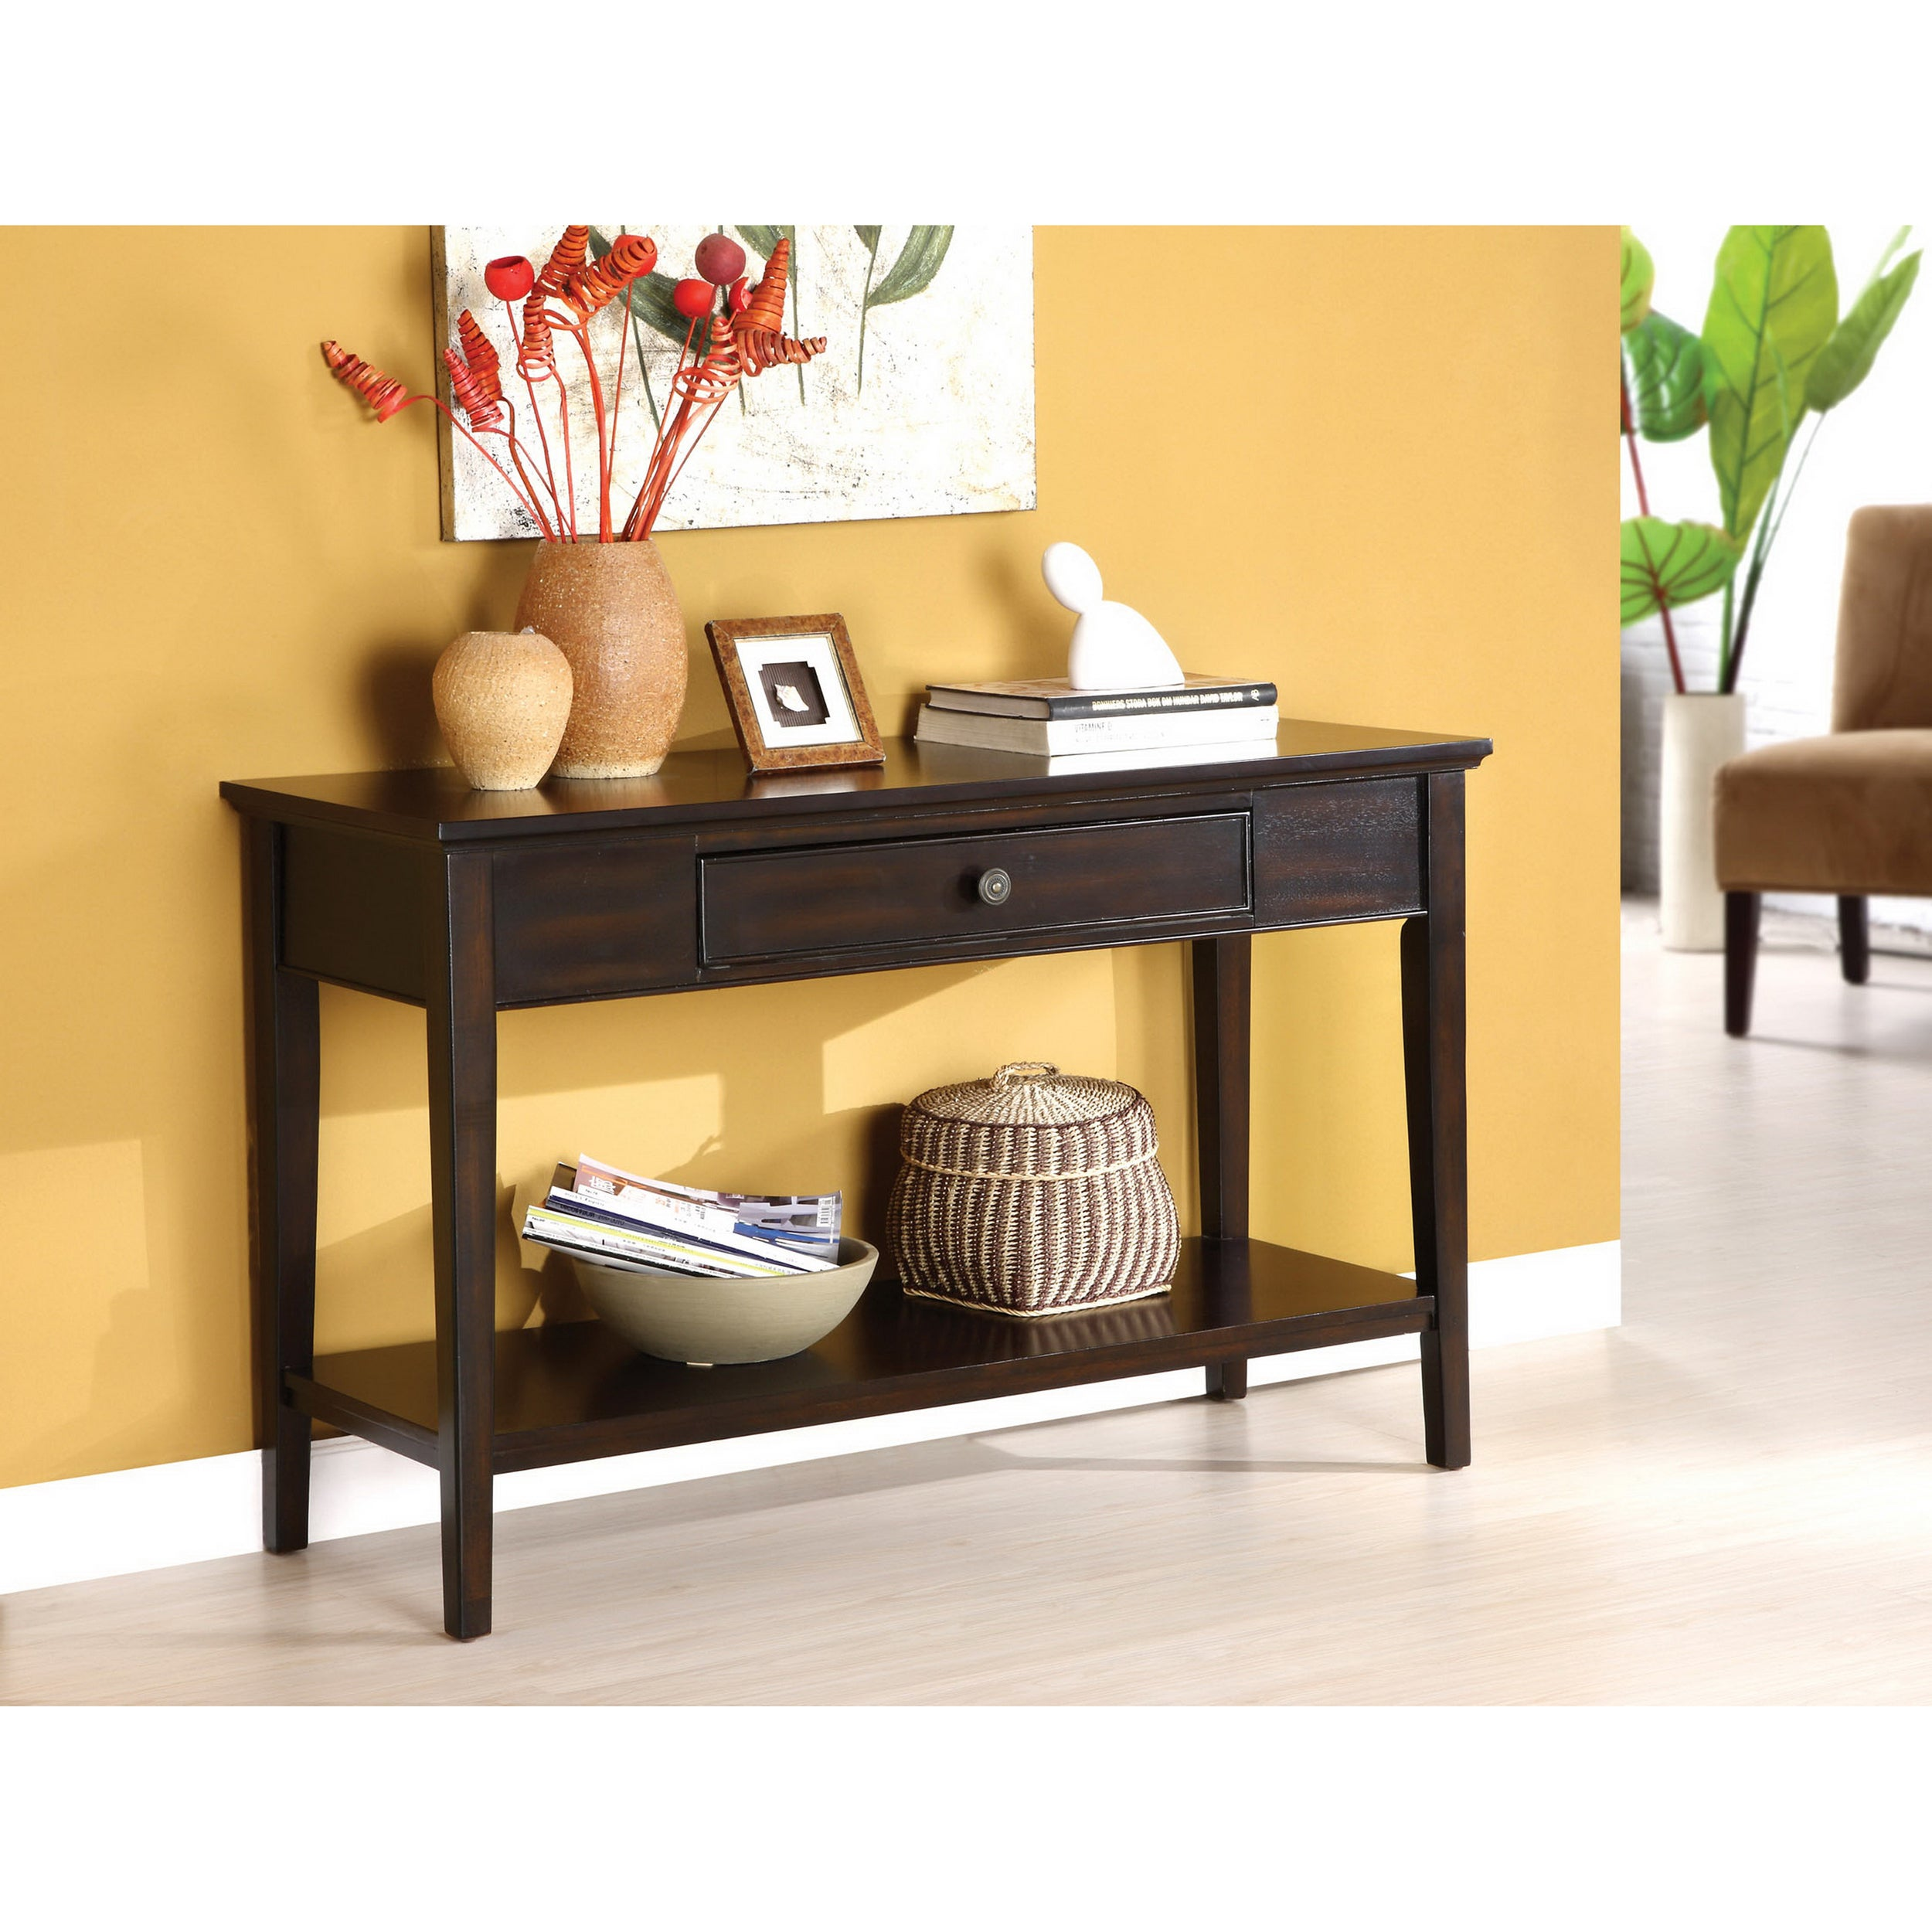 Furniture of America Karlyn Dark Cherry Sofa/ Entryway Table